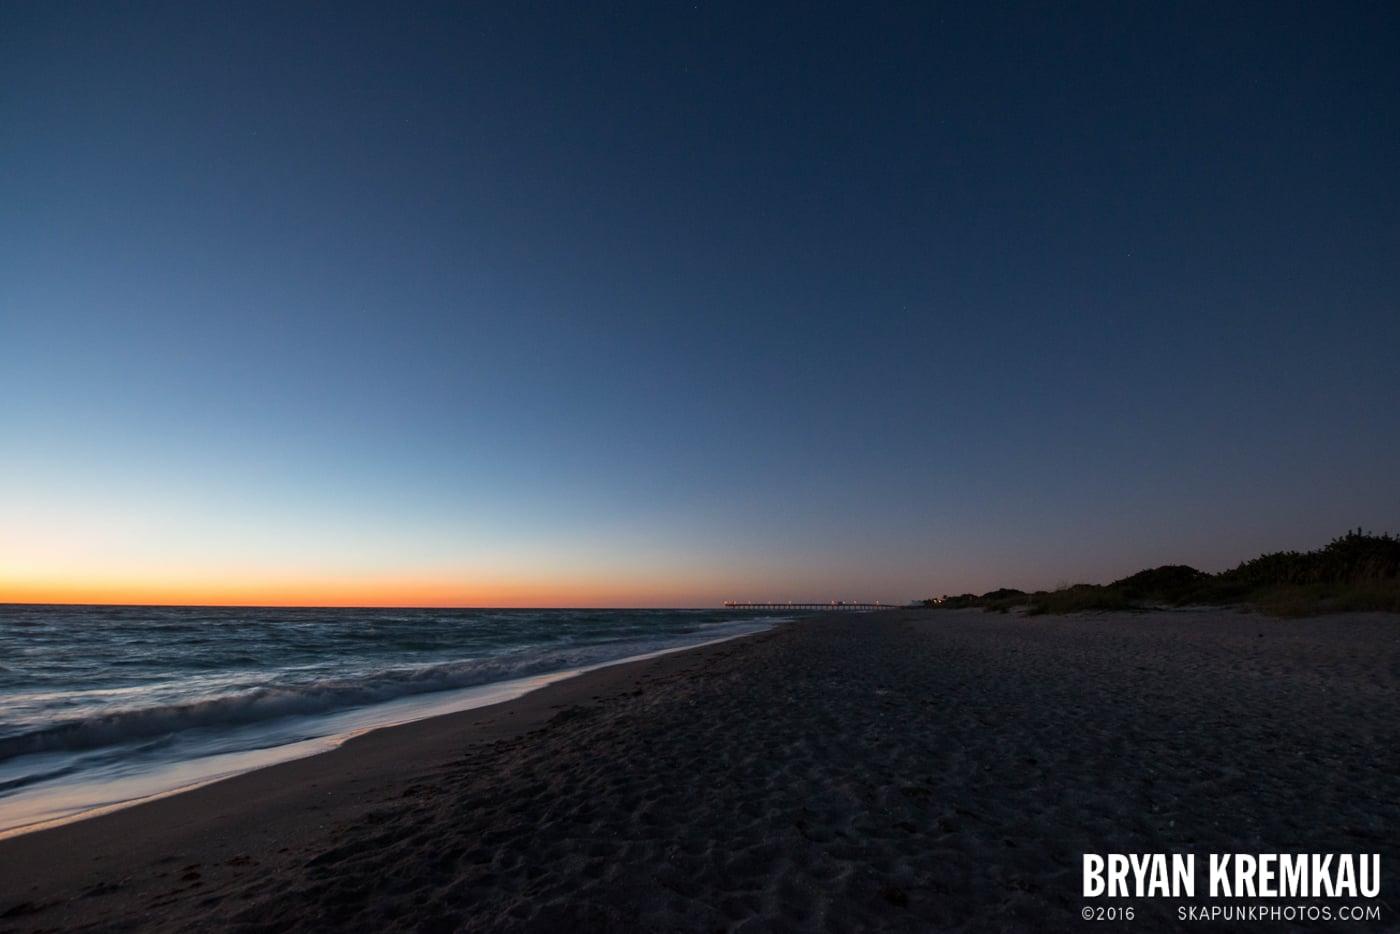 Sunsets, Astrophotography & Birds @ Venice, Florida - 10.25.14 - 11.5.14 (89)